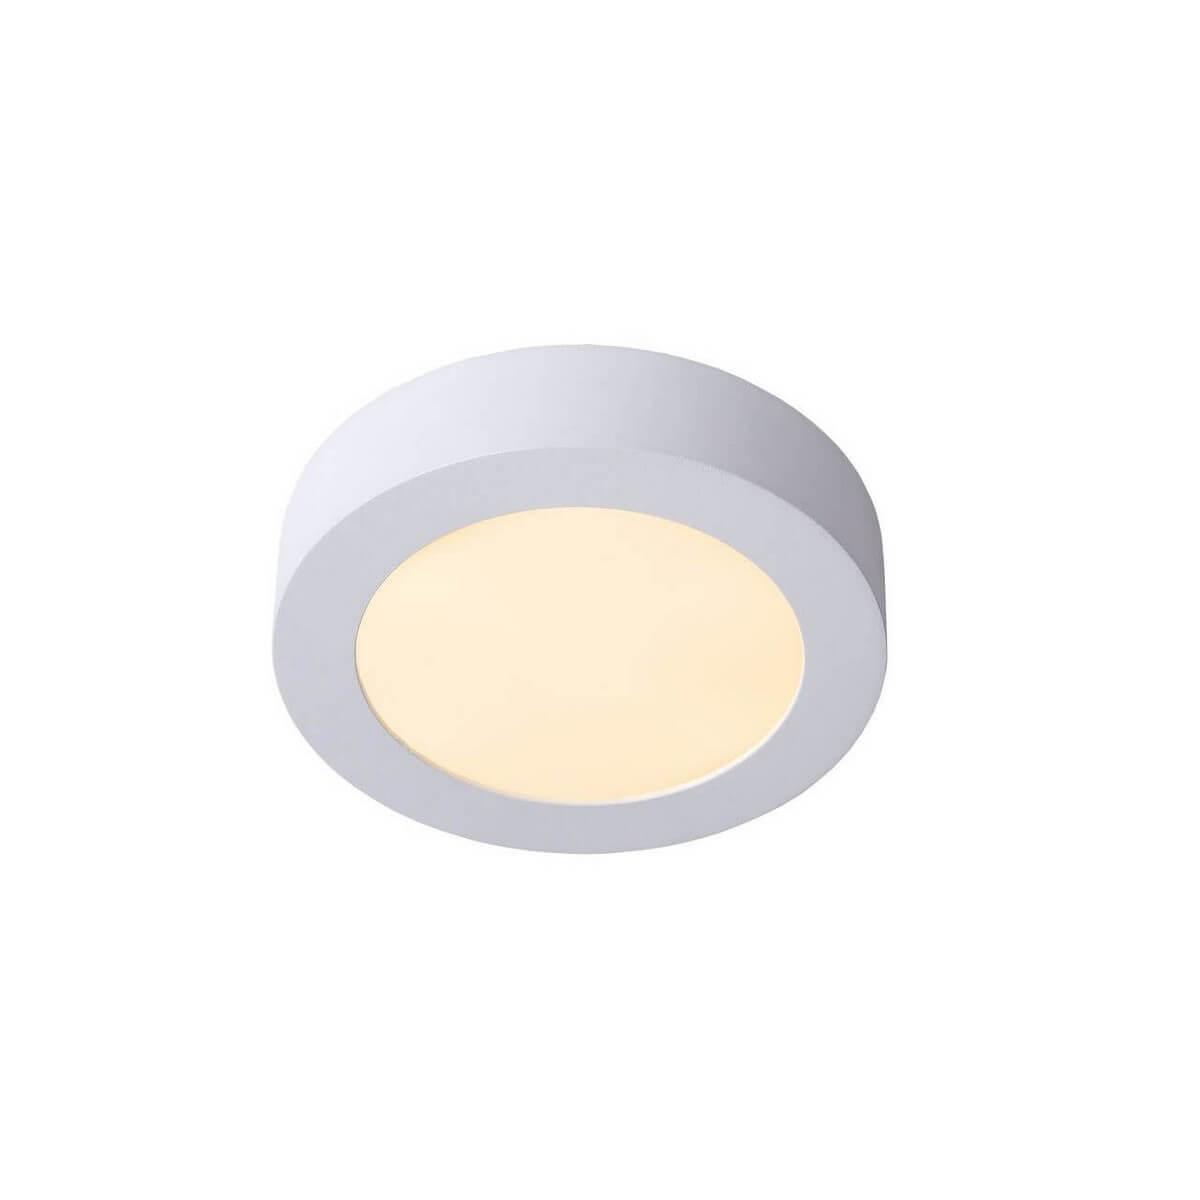 Светильник Lucide 28106/18/31 Brice-Led светильник lucide 35201 18 31 gipsy